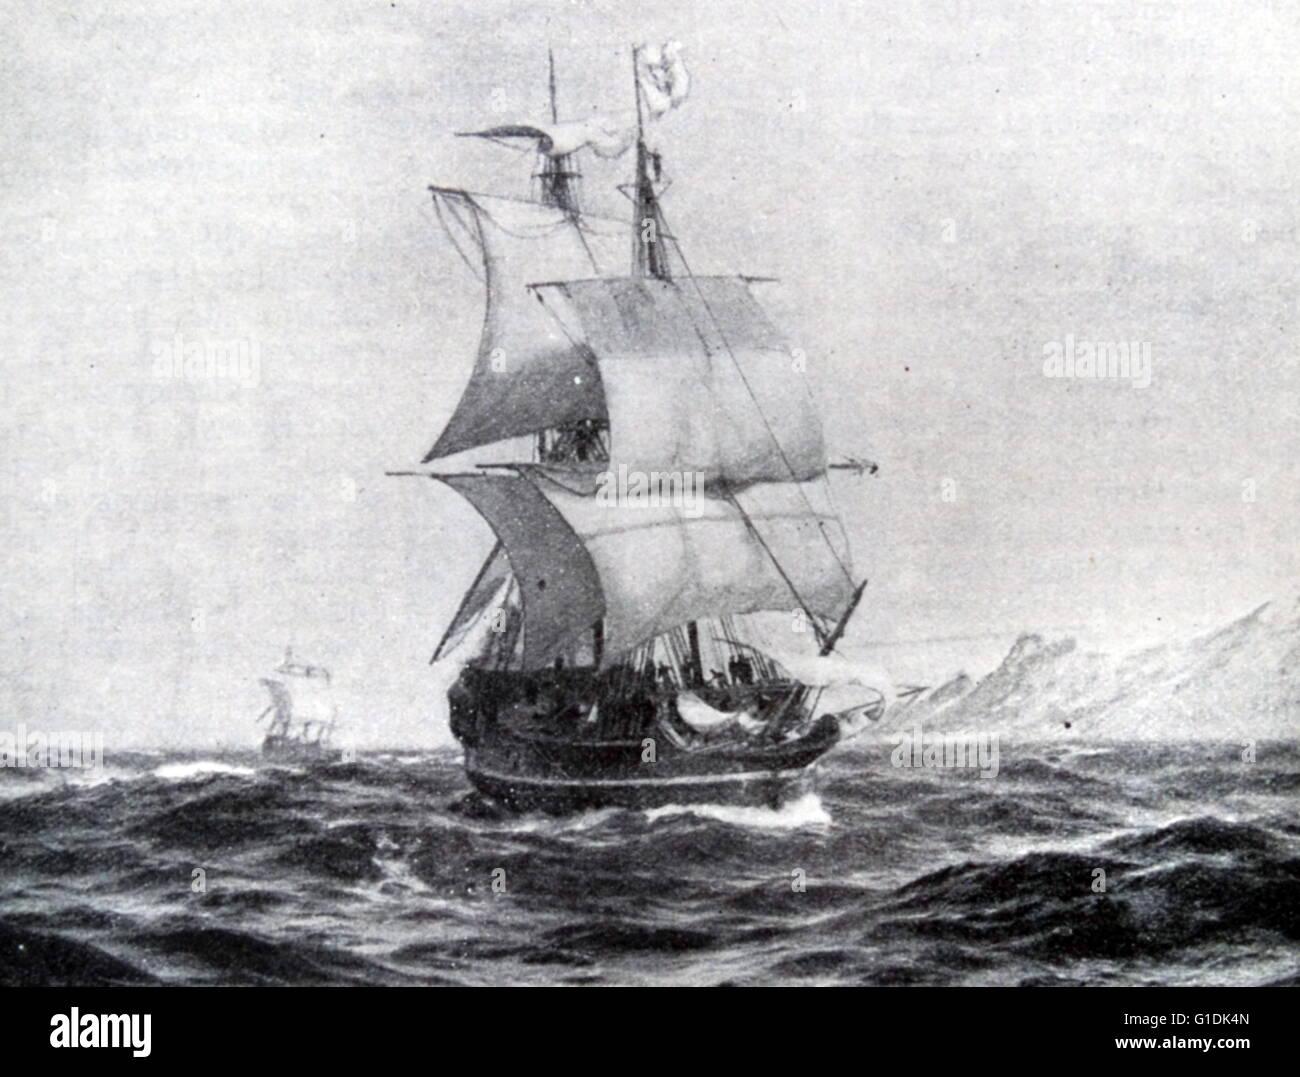 Ferdinand Magellan Portuguese Explorer: Ship Of Ferdinand Magellan (1480-1521) A Portuguese